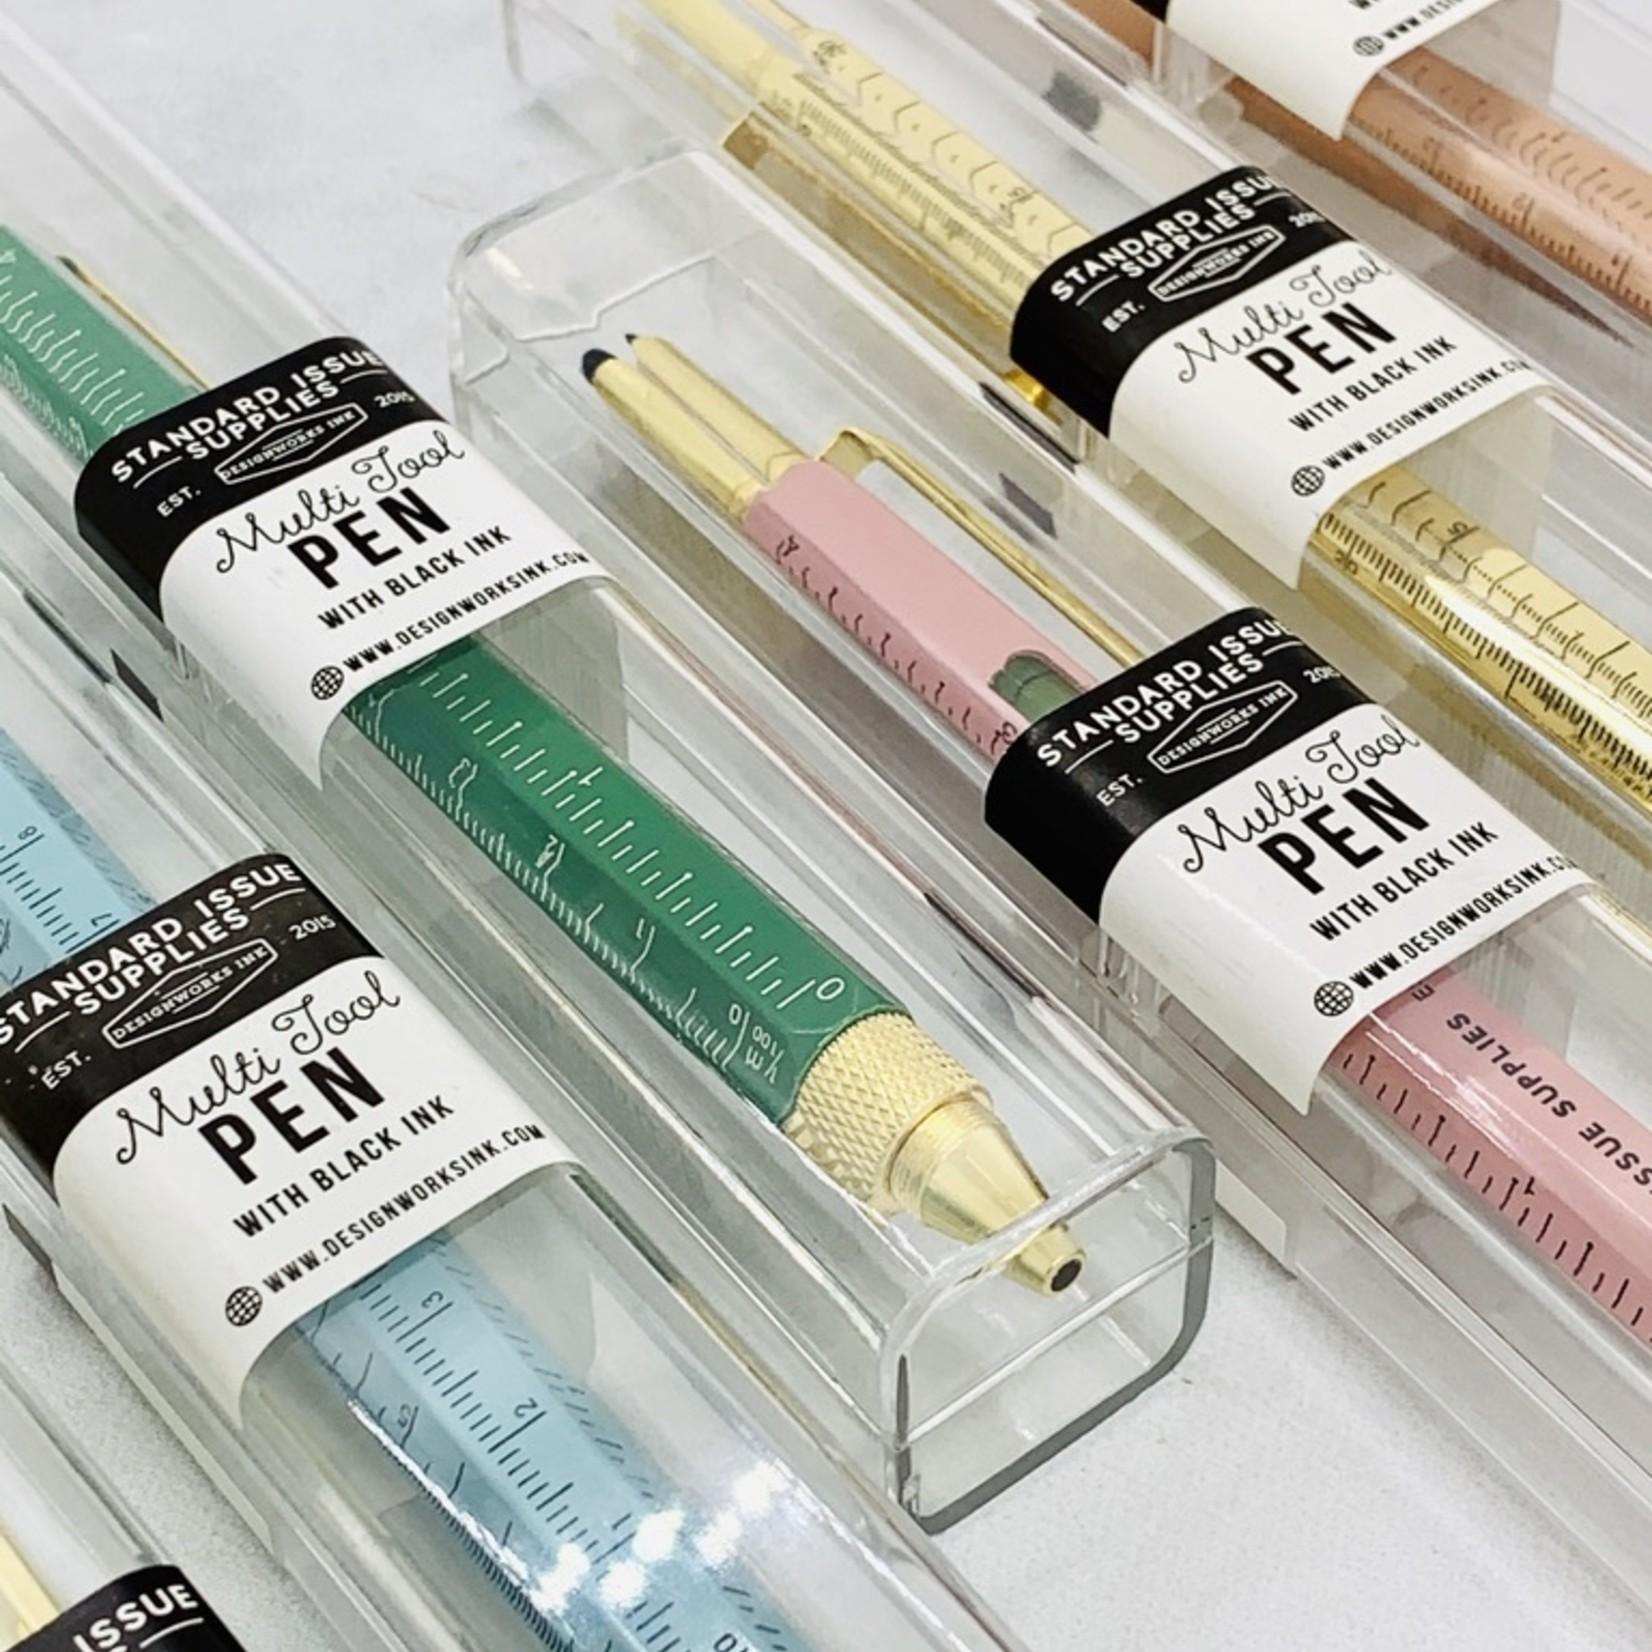 Design Works Standard Issue Tool Pen: